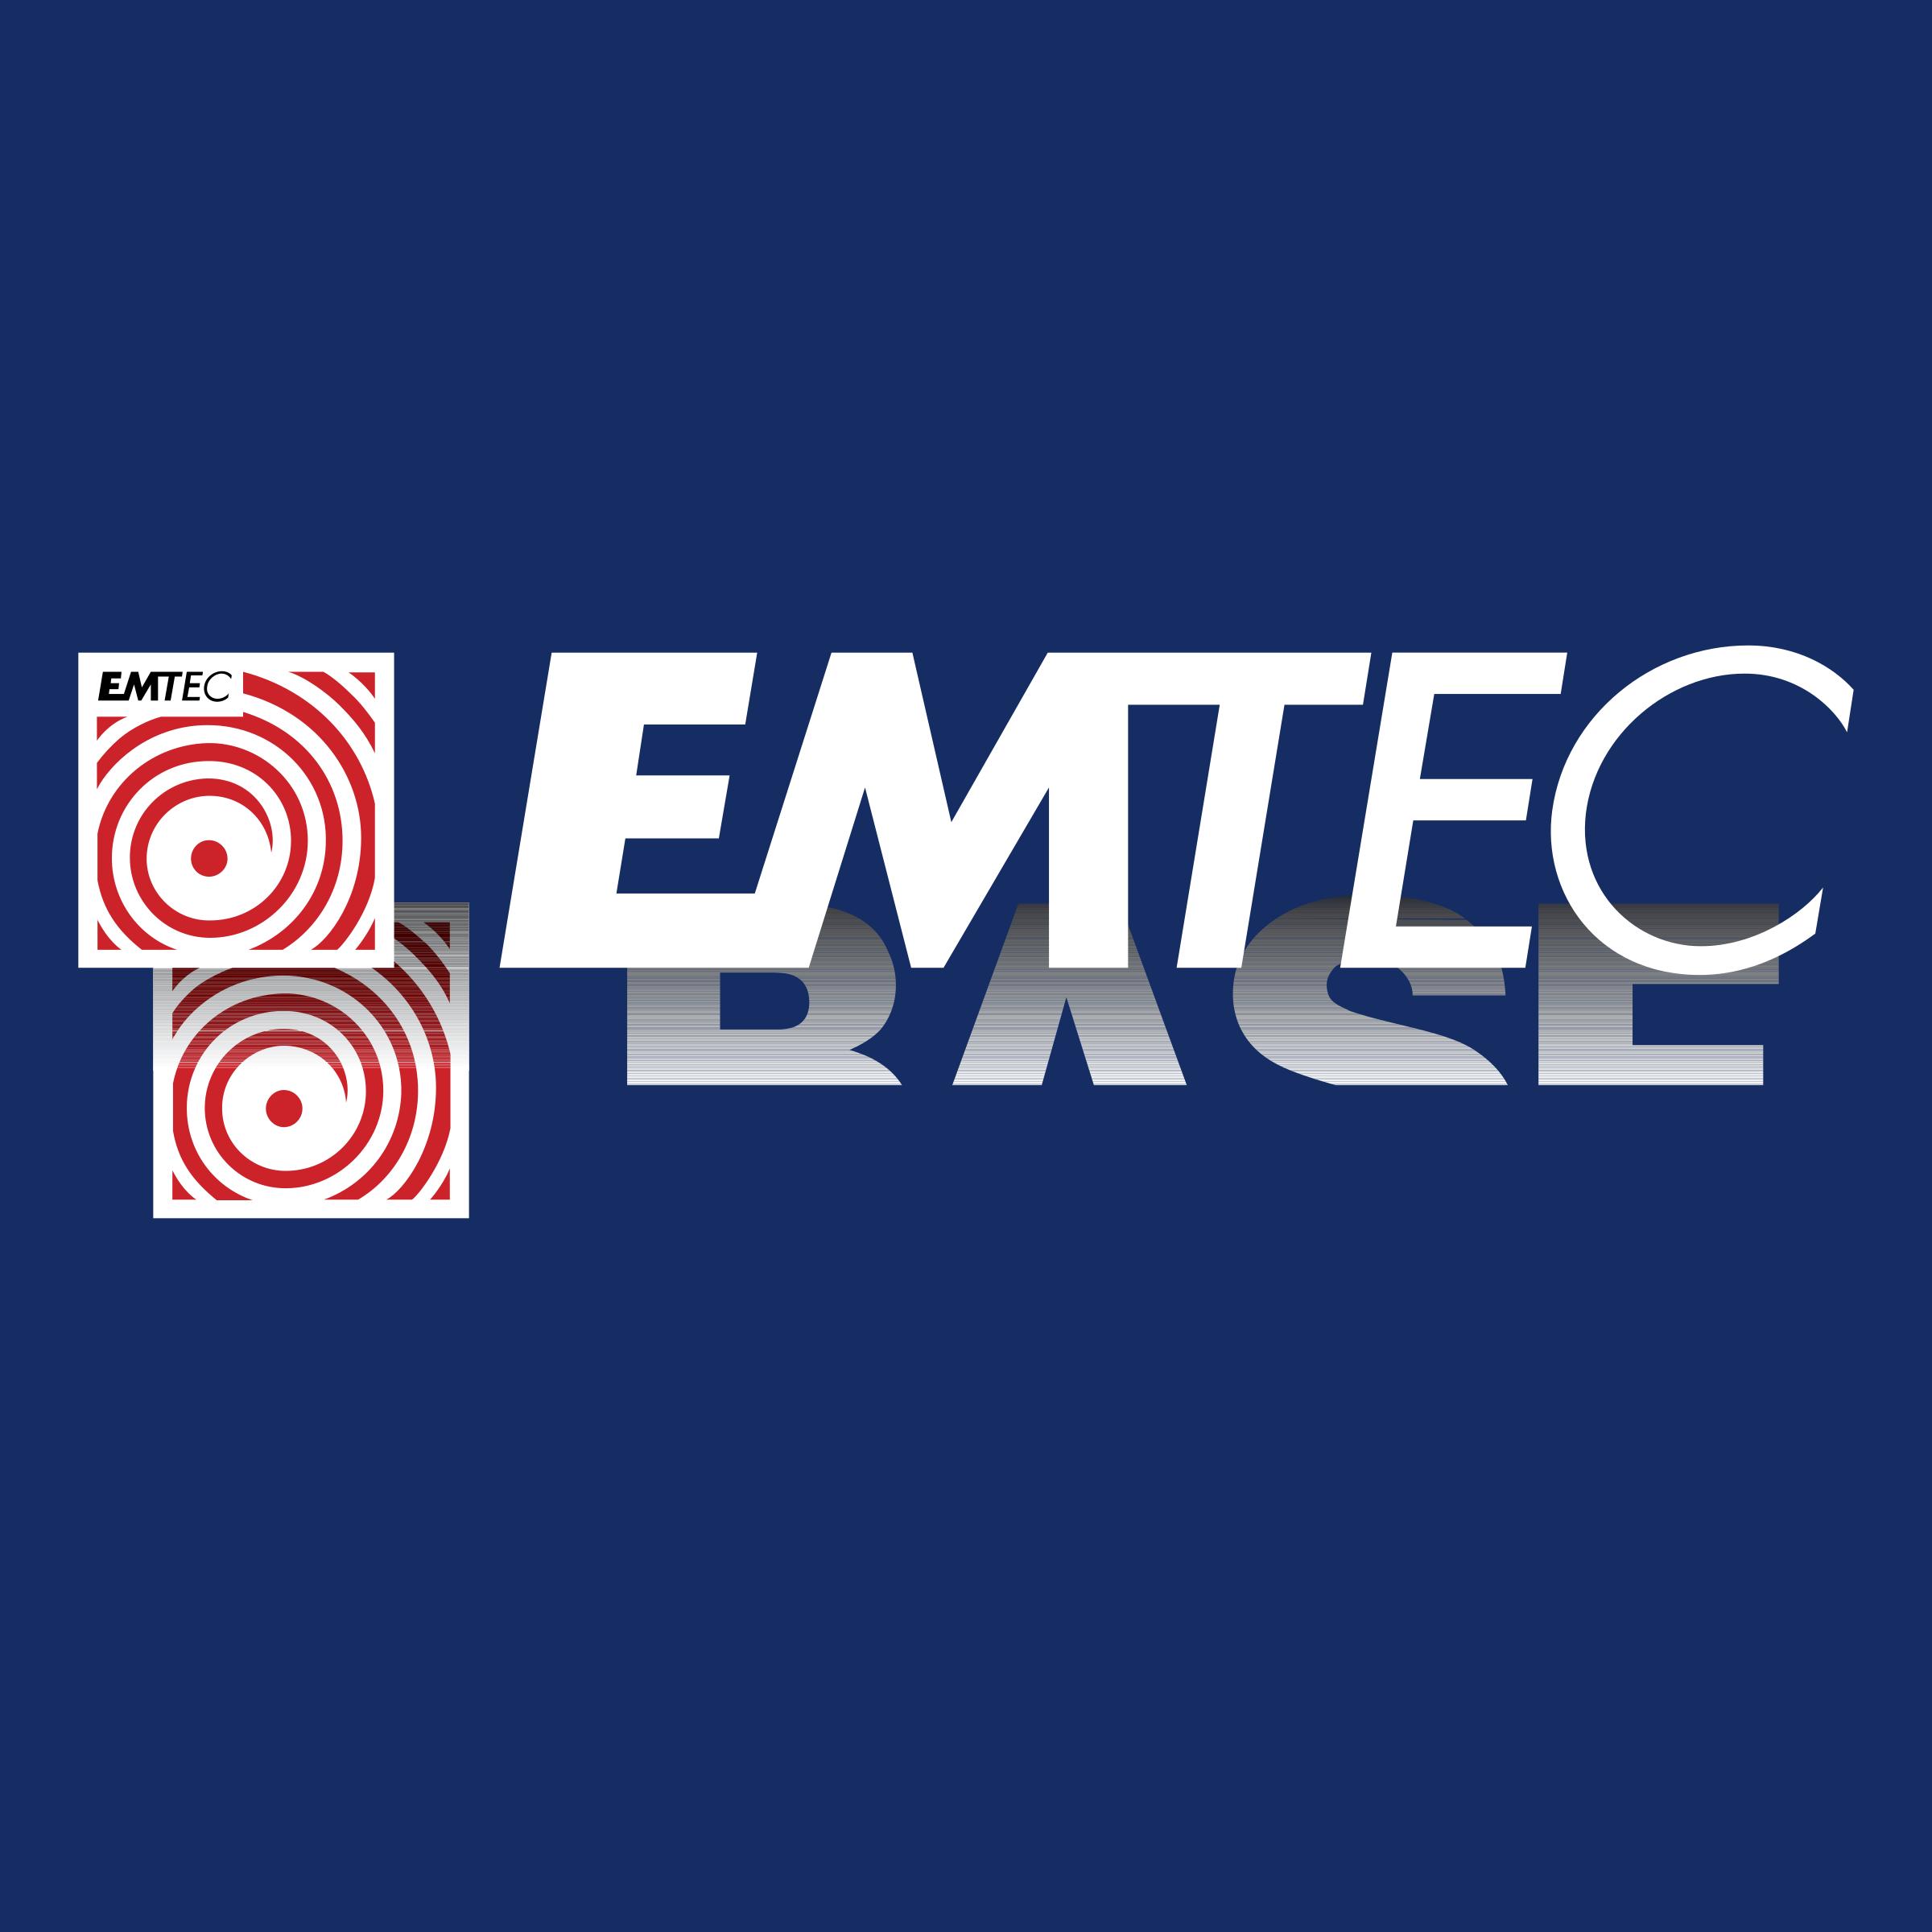 EMTEC BASF Logo PNG Transparent & SVG Vector - Freebie Supply